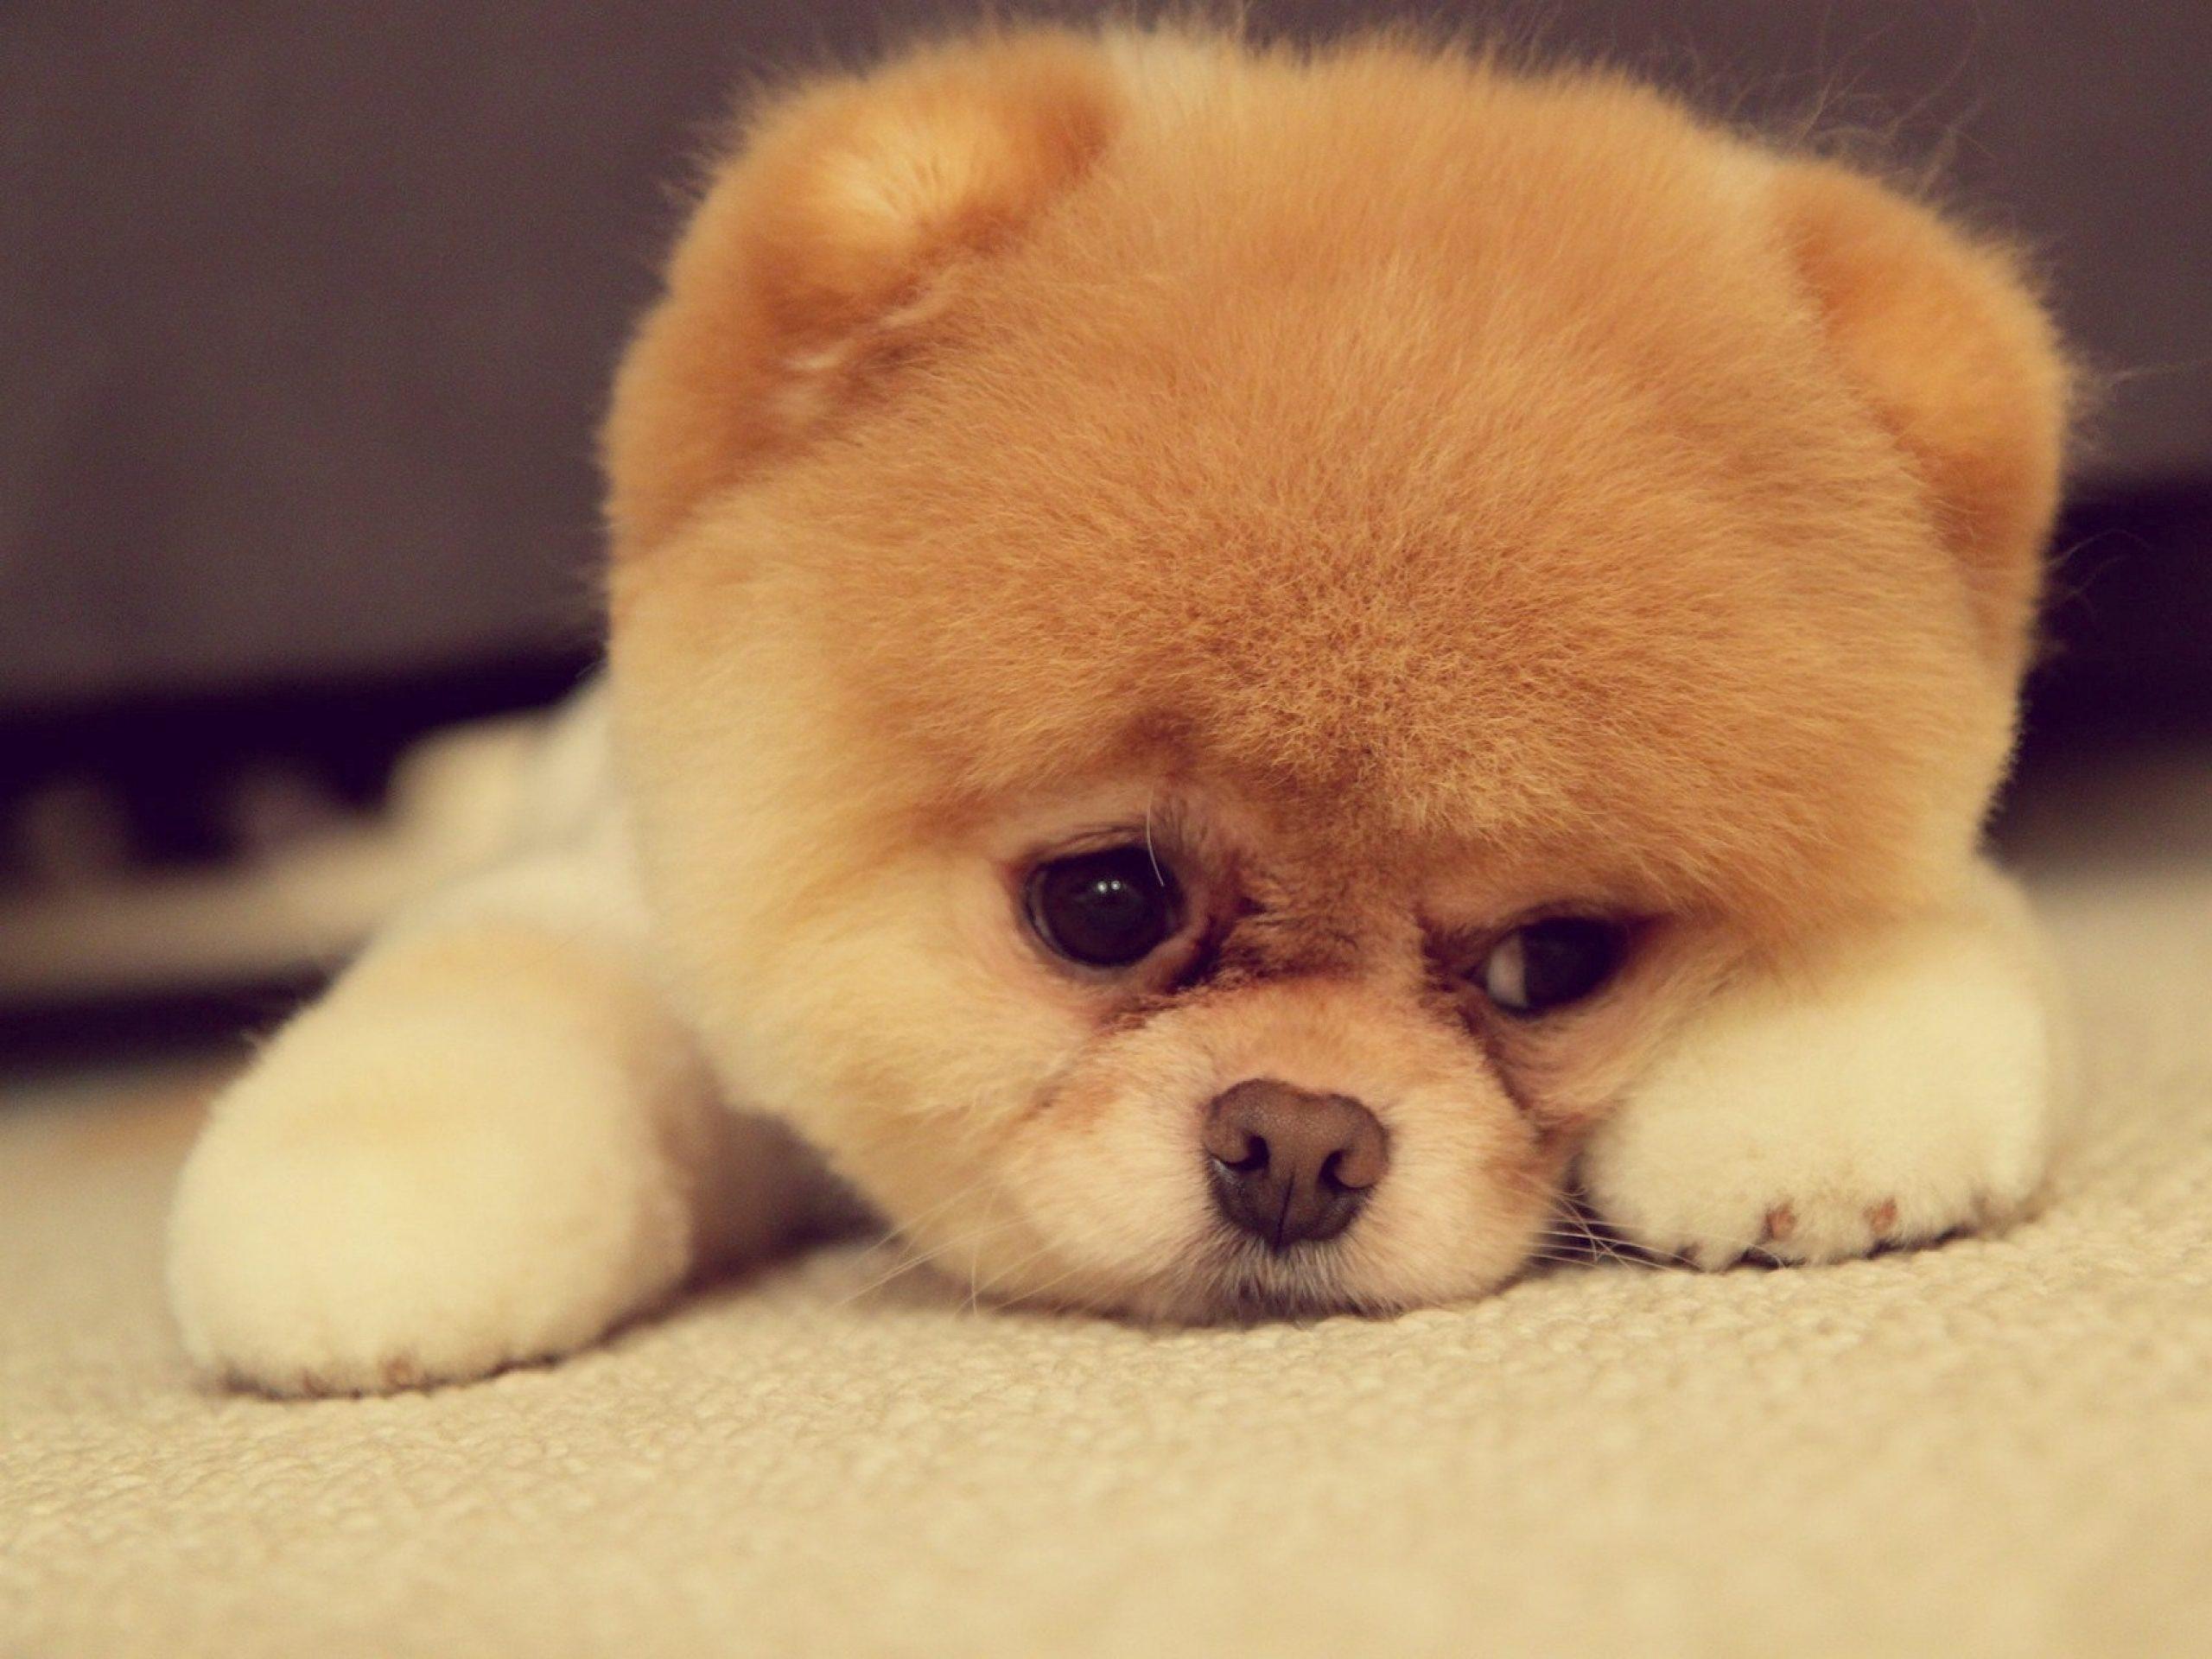 6945118-sad-puppy-face (1).jpg